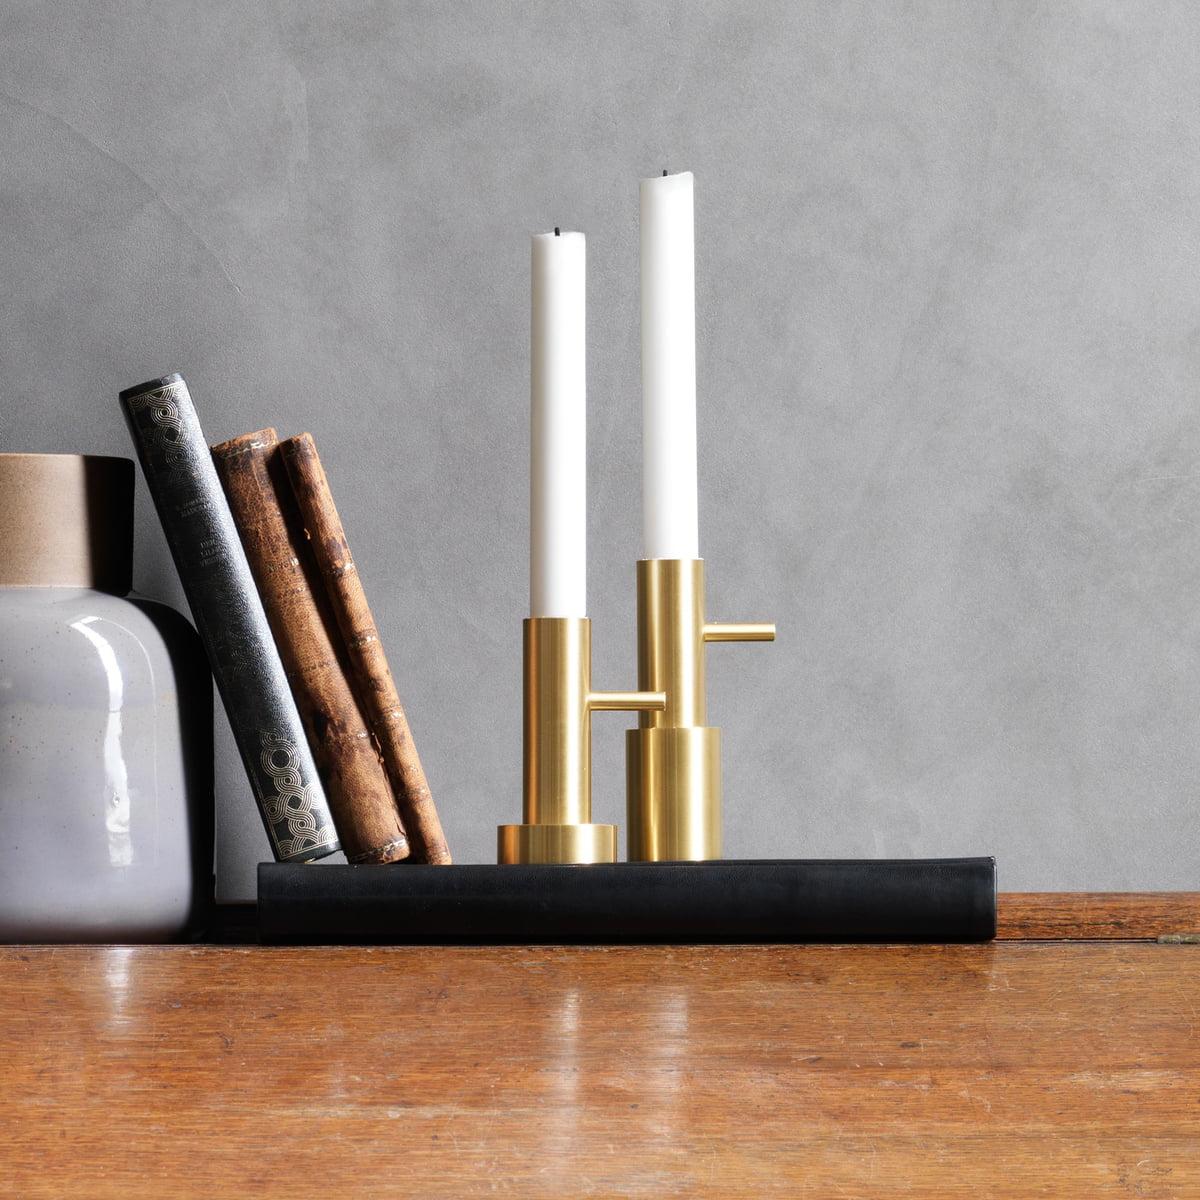 kerzenst nder fritz hansen objects connox. Black Bedroom Furniture Sets. Home Design Ideas